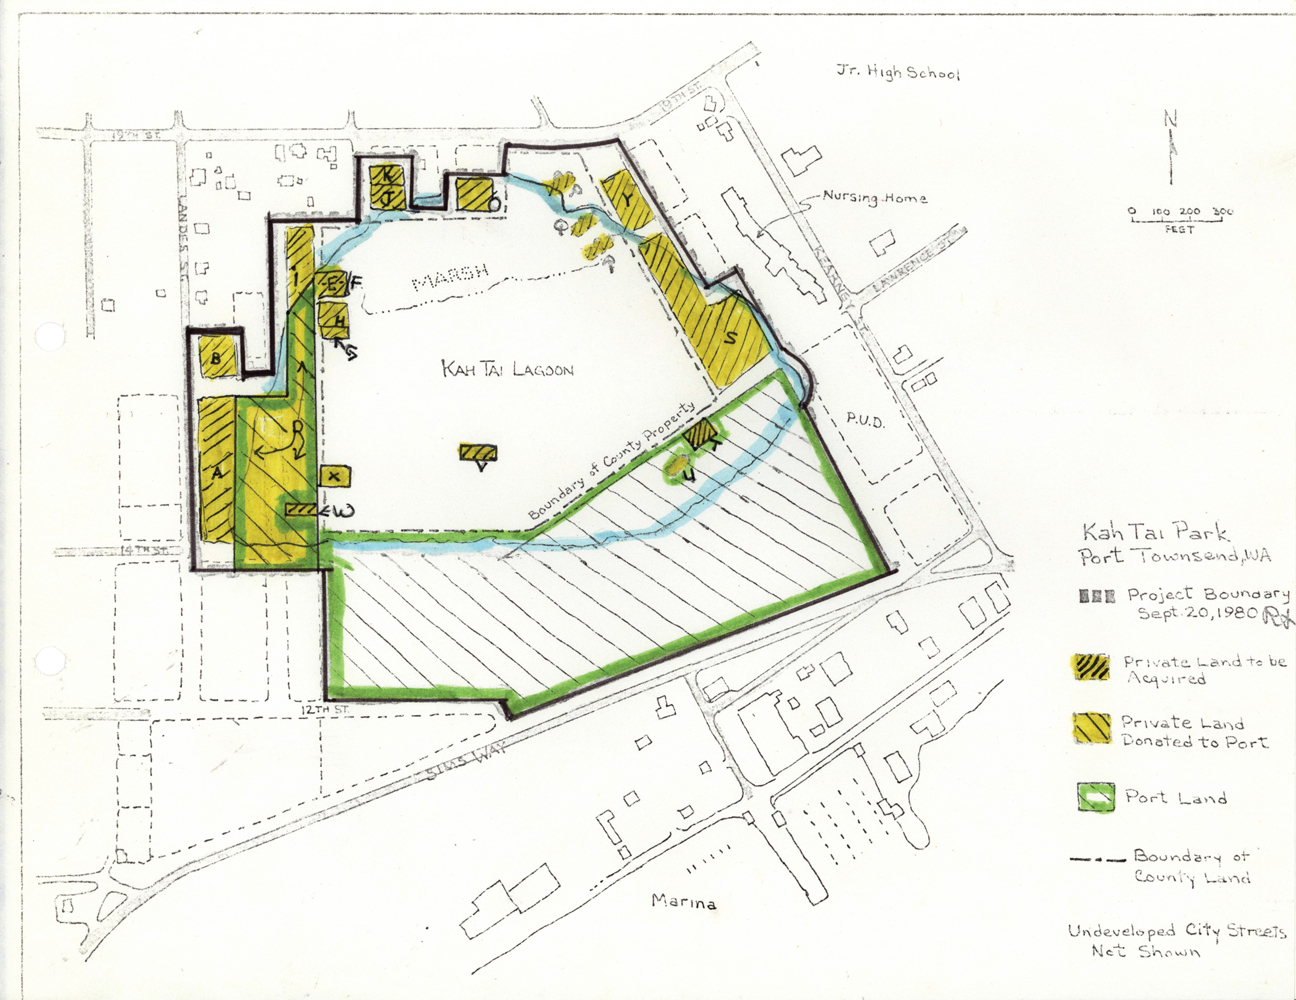 Kah tai lagoon nature park kah tai lagoon nature park for Find plot plan online